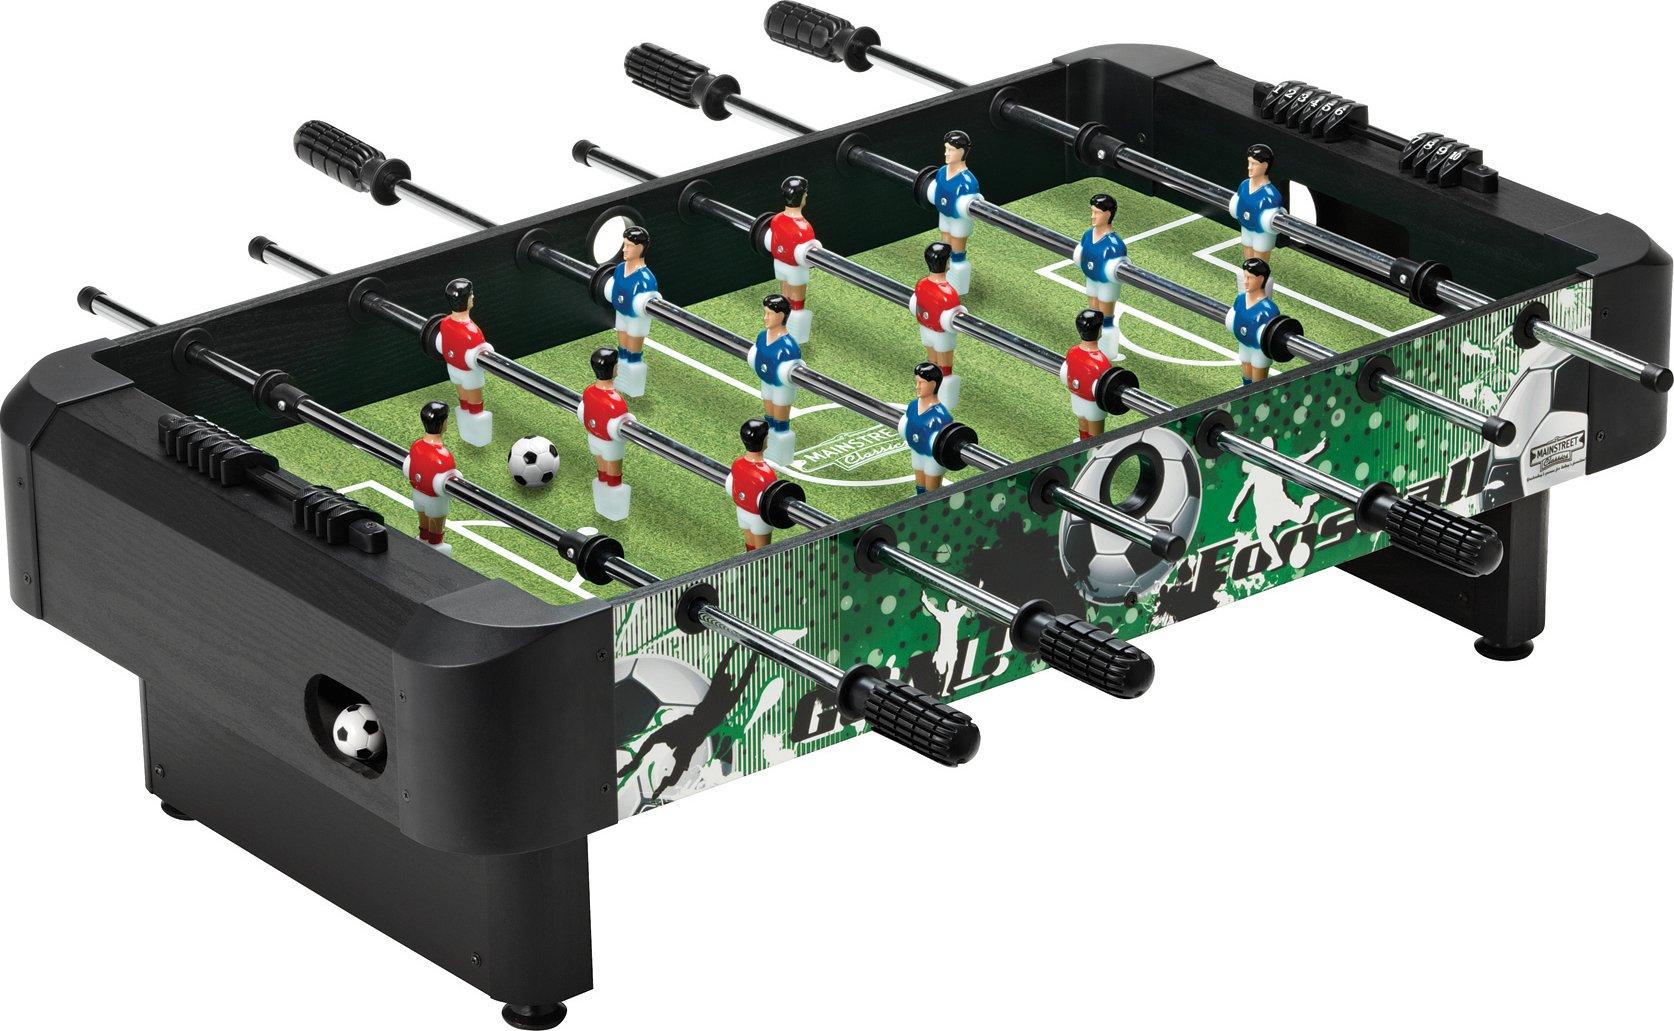 Mainstreet Classics 36-Inch Table Top Foosball/Soccer Game by Mainstreet Classics by GLD Products (Image #1)